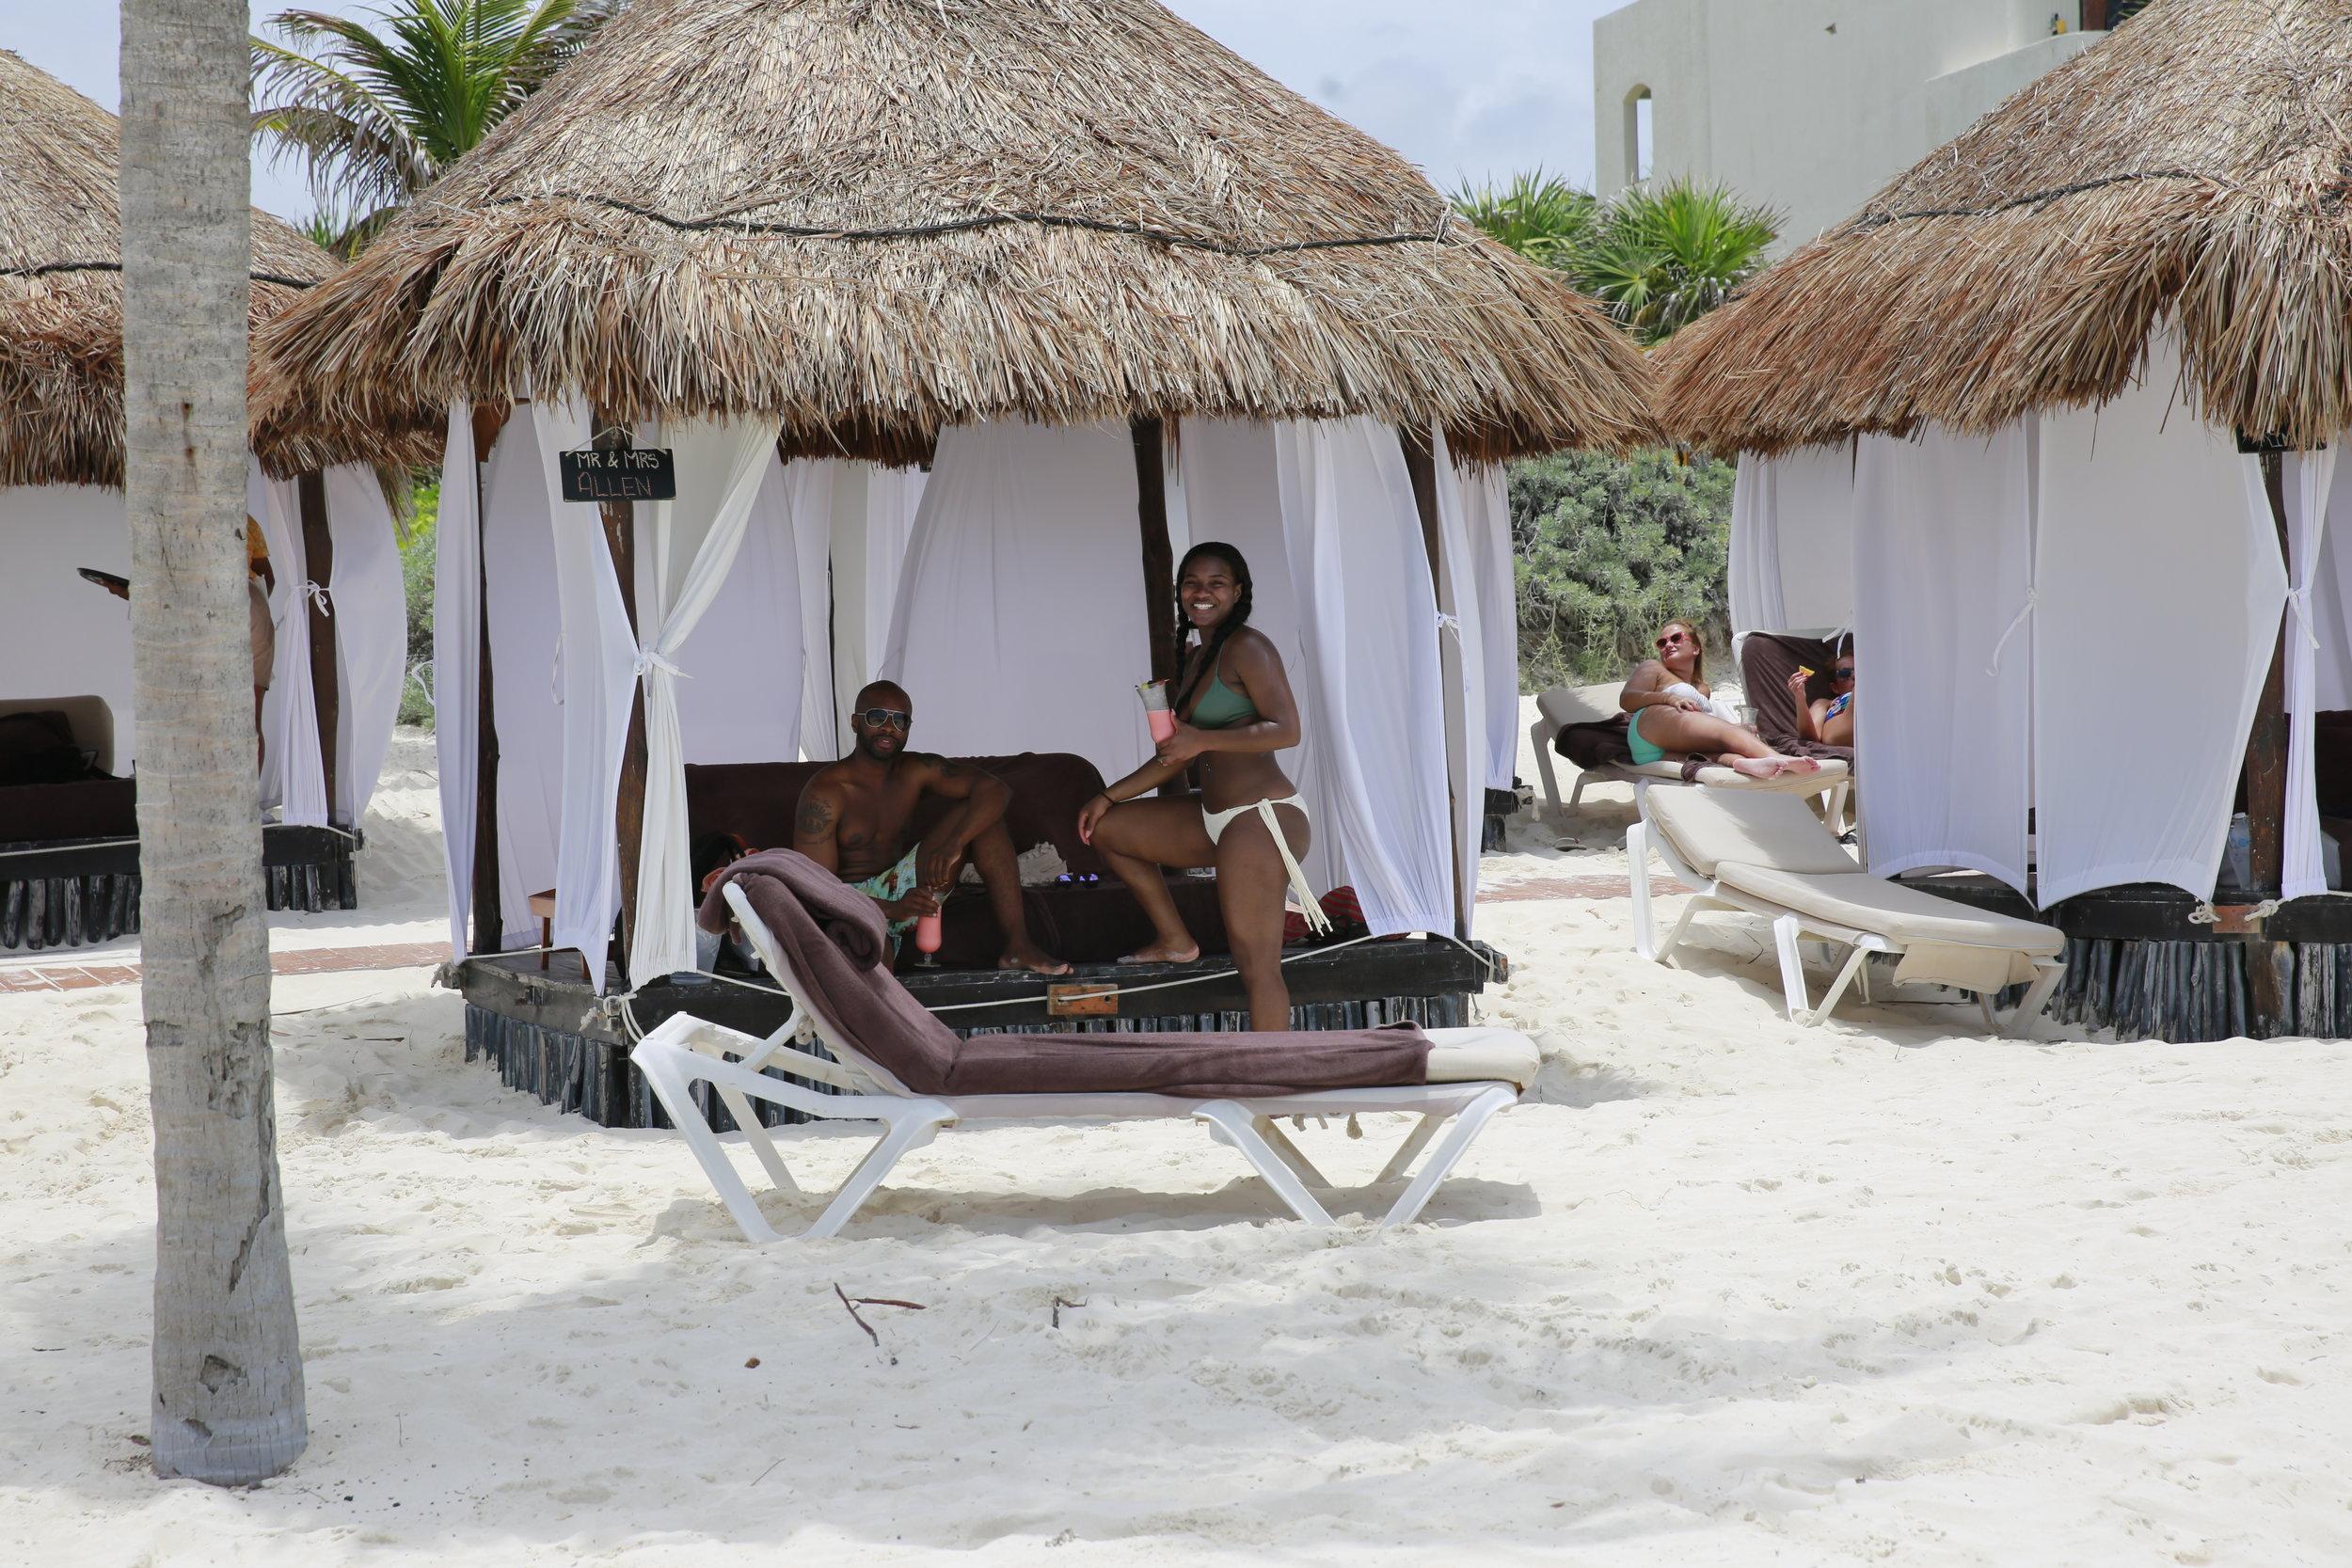 Black Destination Bride - BlackDesti Wedding Countdown Journal - Bridefriends Podcast - 1 Playa del Carmen Mexico - Secrets Maroma beach cabana.JPG